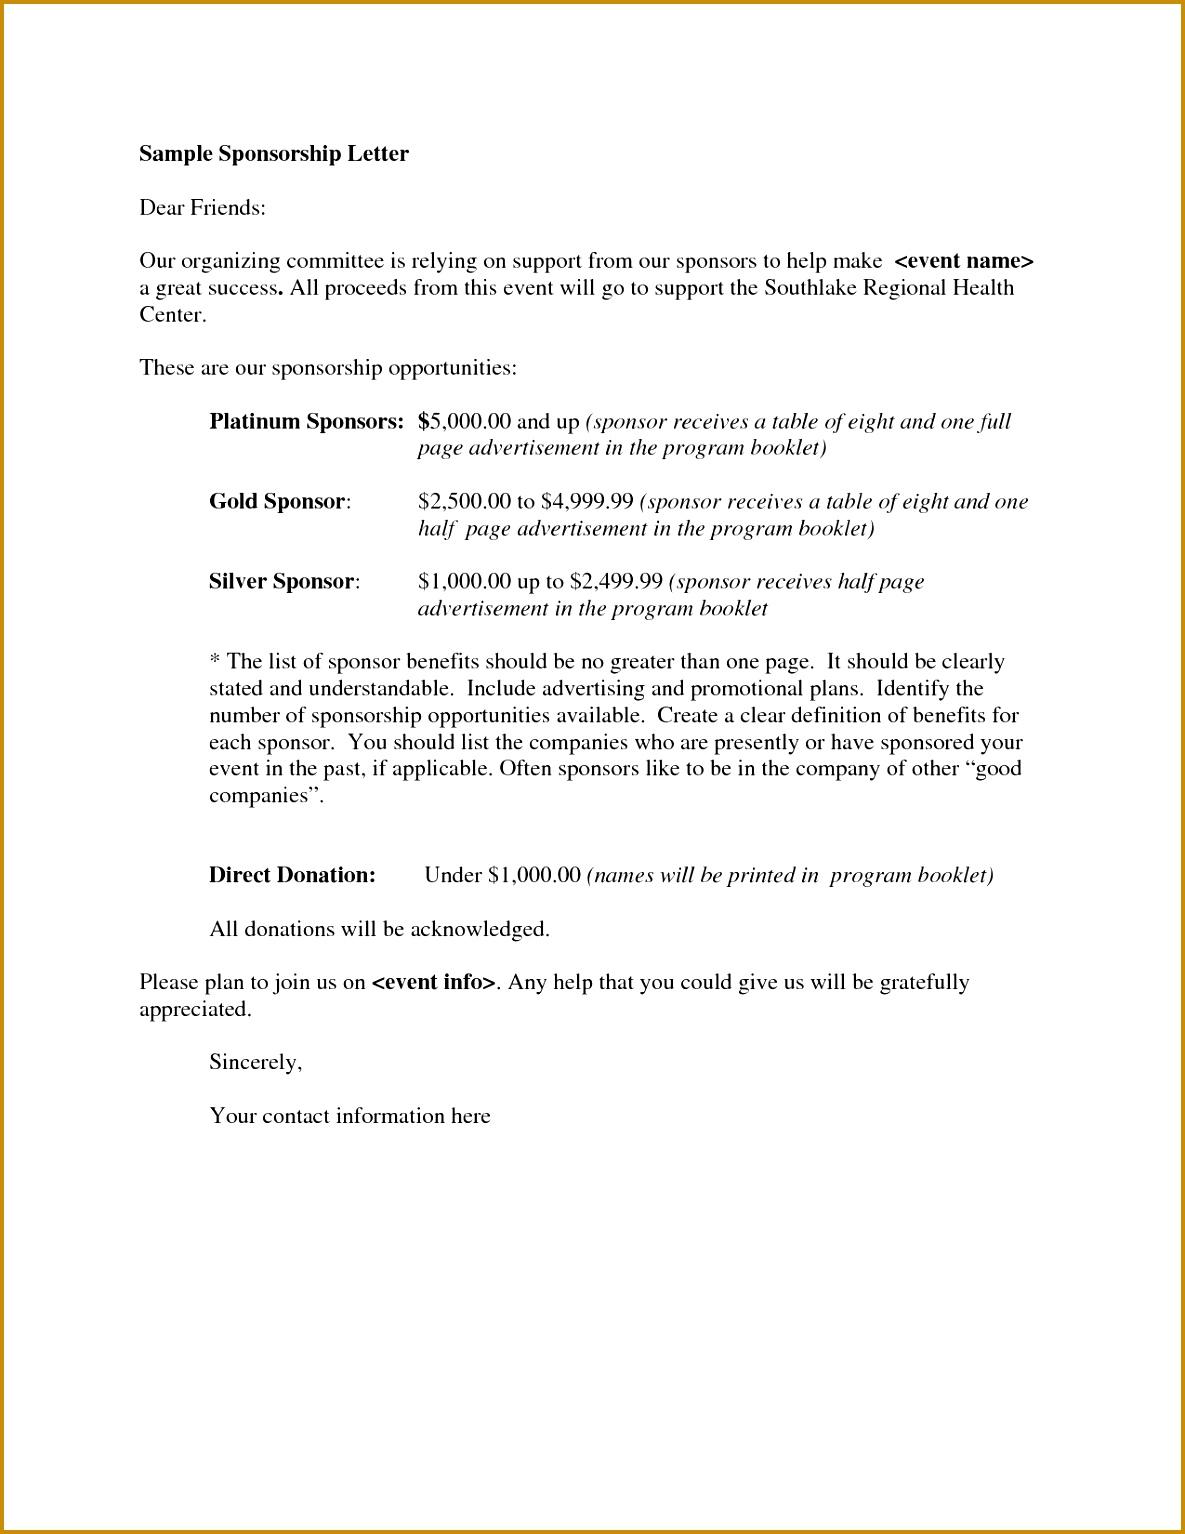 Sponsorship Letter Proposal 40 Sponsorship Letter Sponsorship 15341185